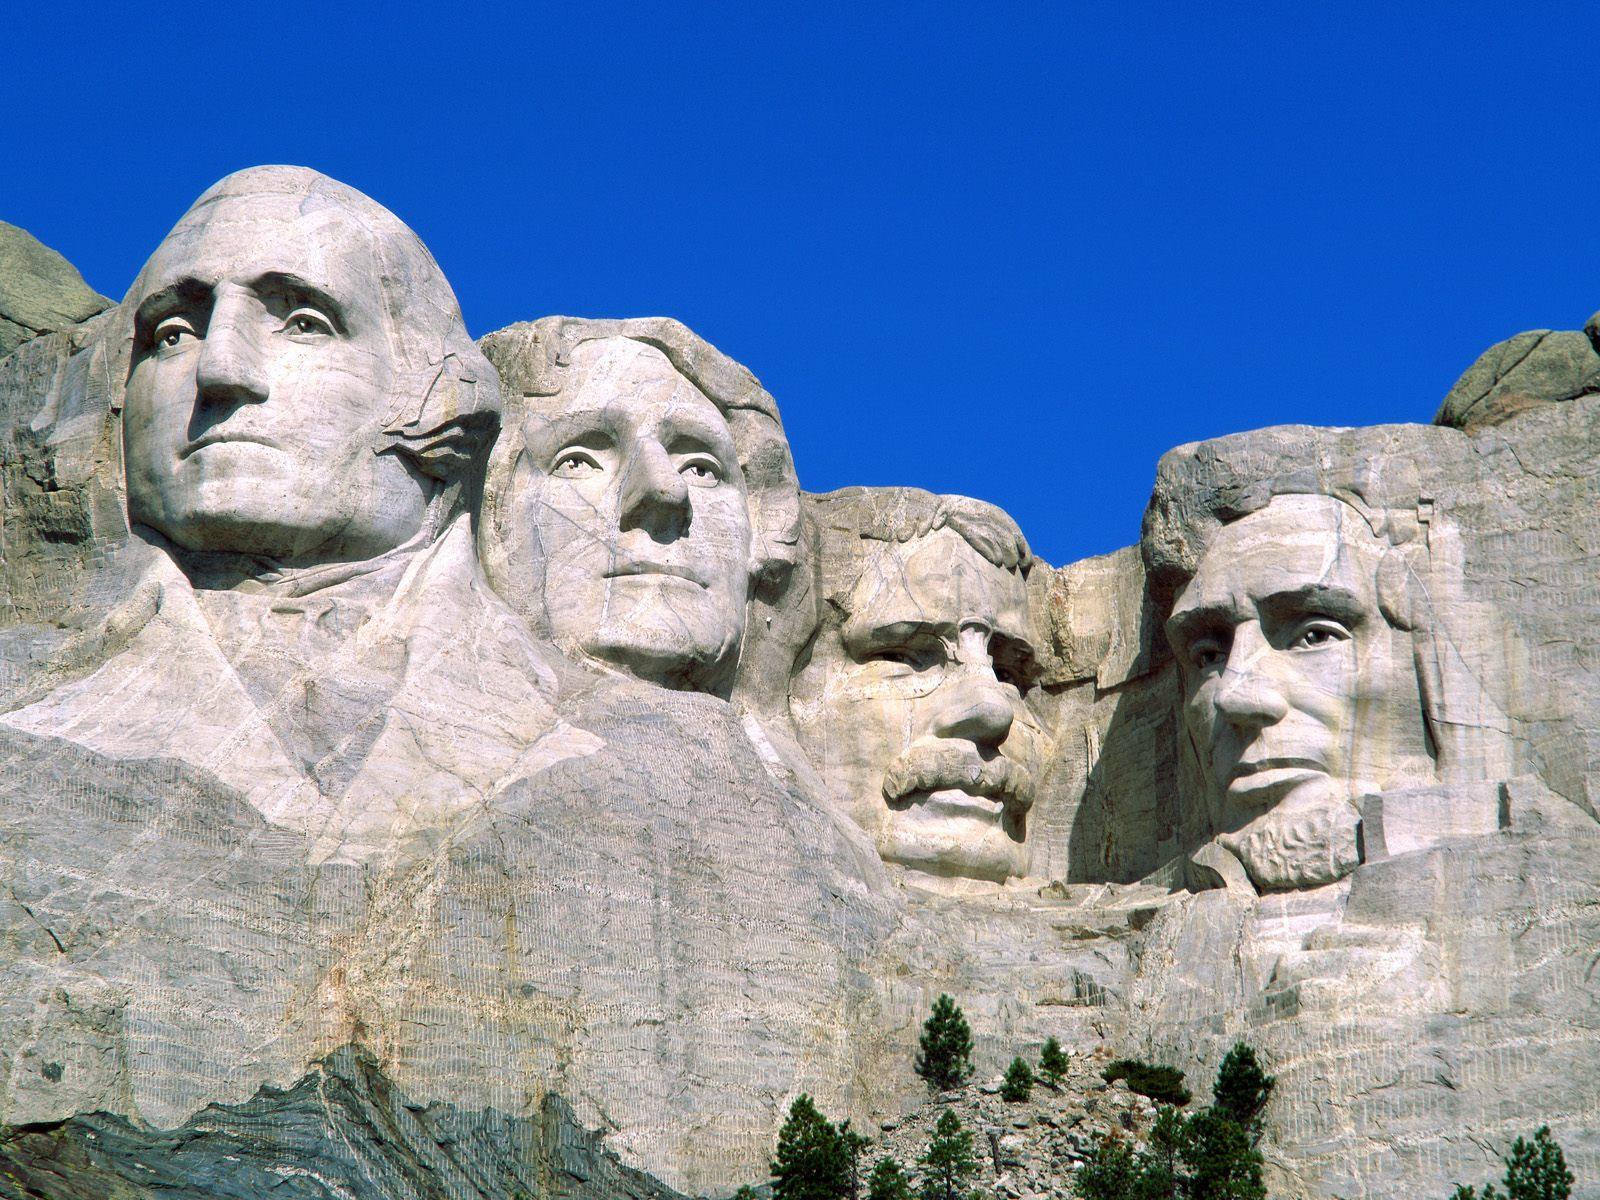 Presidential Portraits Mount Rushmore National Monument South Dakota